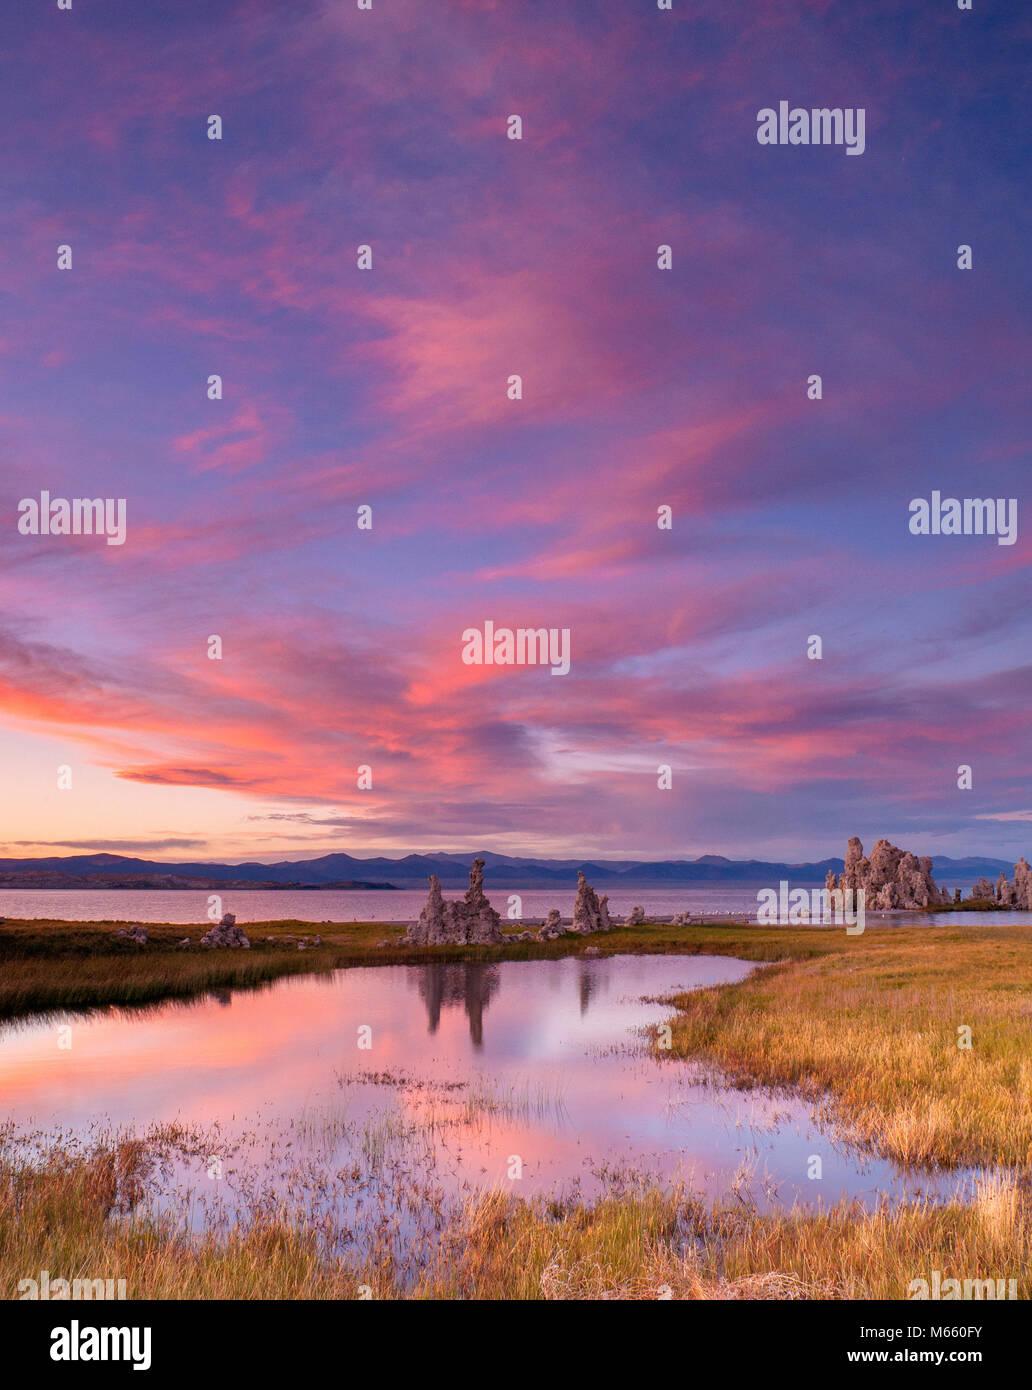 Sonnenuntergang, Feuchtgebiete, Tuffstein Formationen, Mono Lake, Mono Becken NF Scenic Area, Inyo NF, CA Stockbild